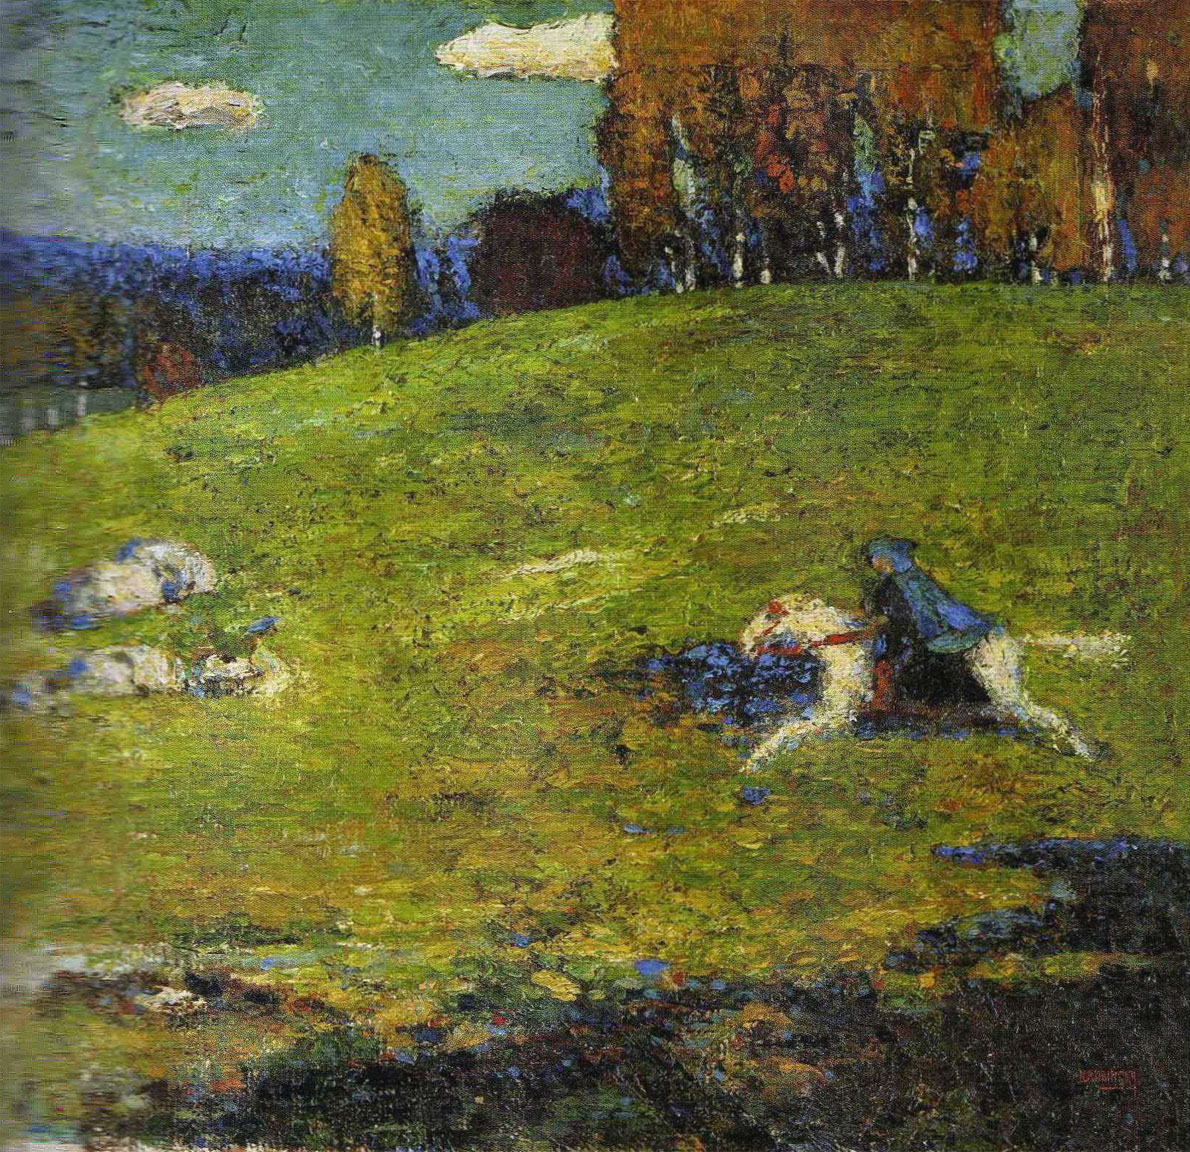 Cavaliere azzurro - opera di Kandinsky